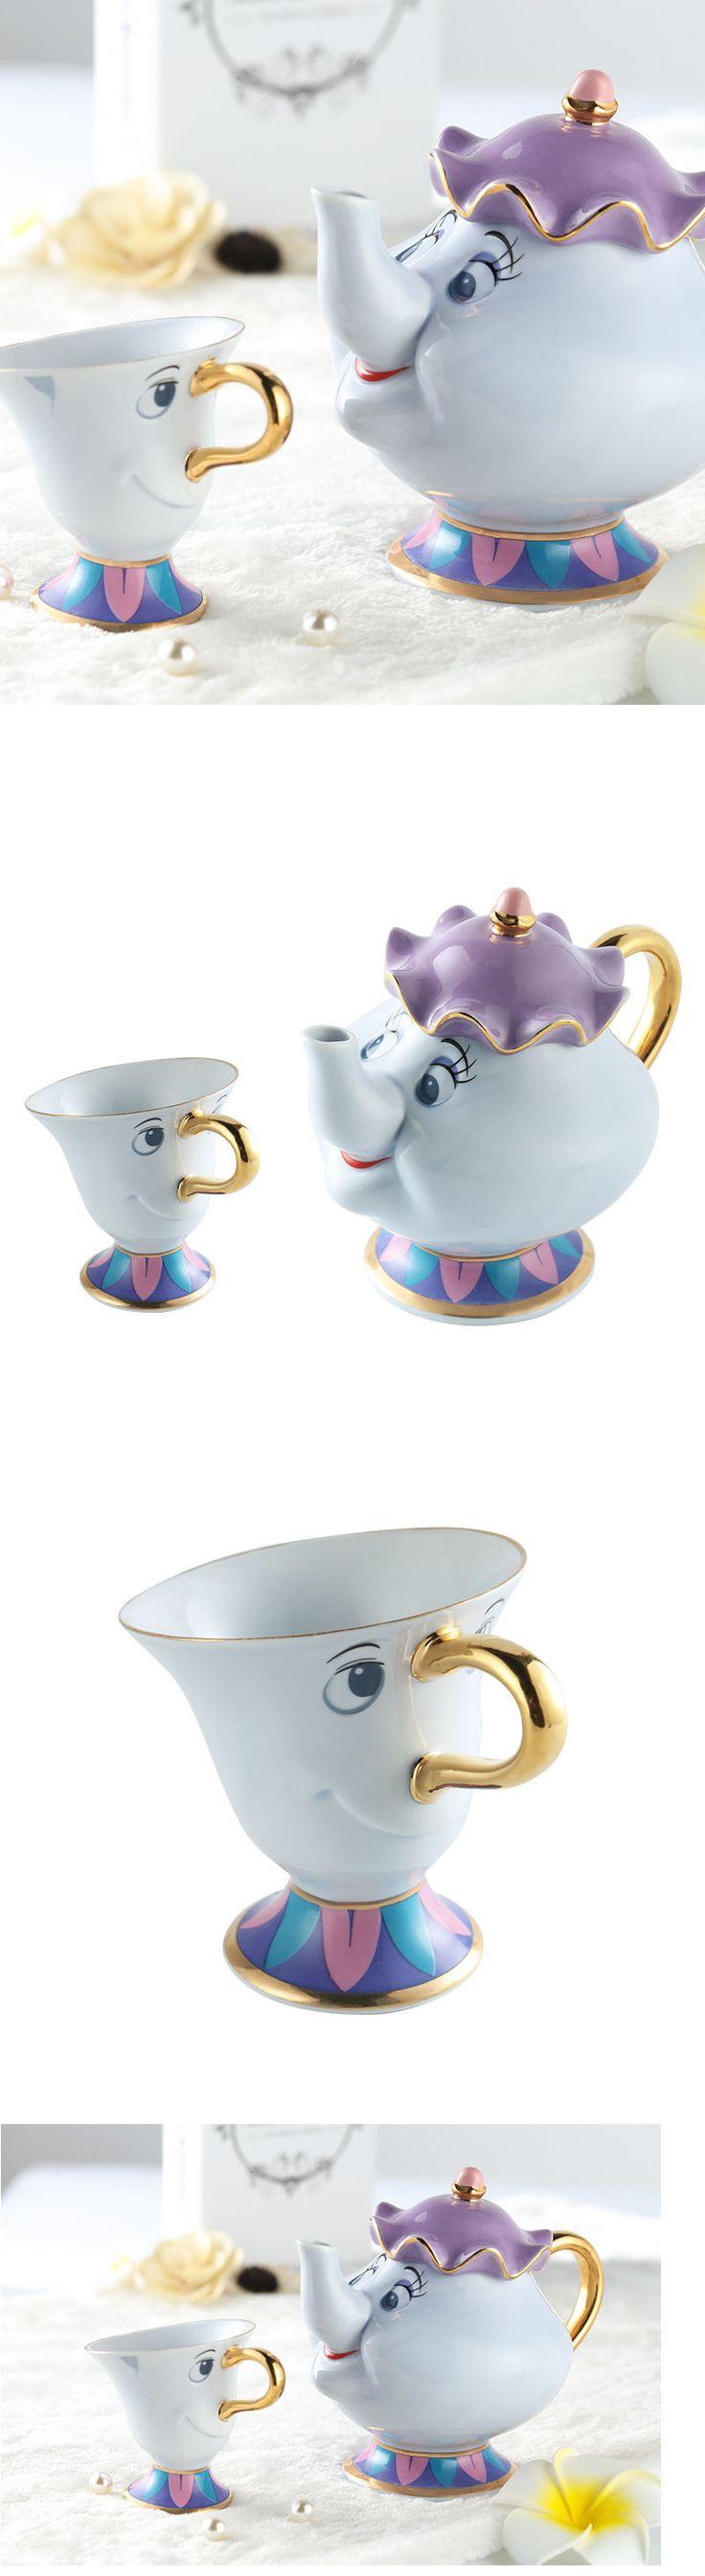 Mrs potts chip christmas decoration - Beauty And The Beast 44033 Hot Sale Beauty And The Beast Tea Pot Set Mrs